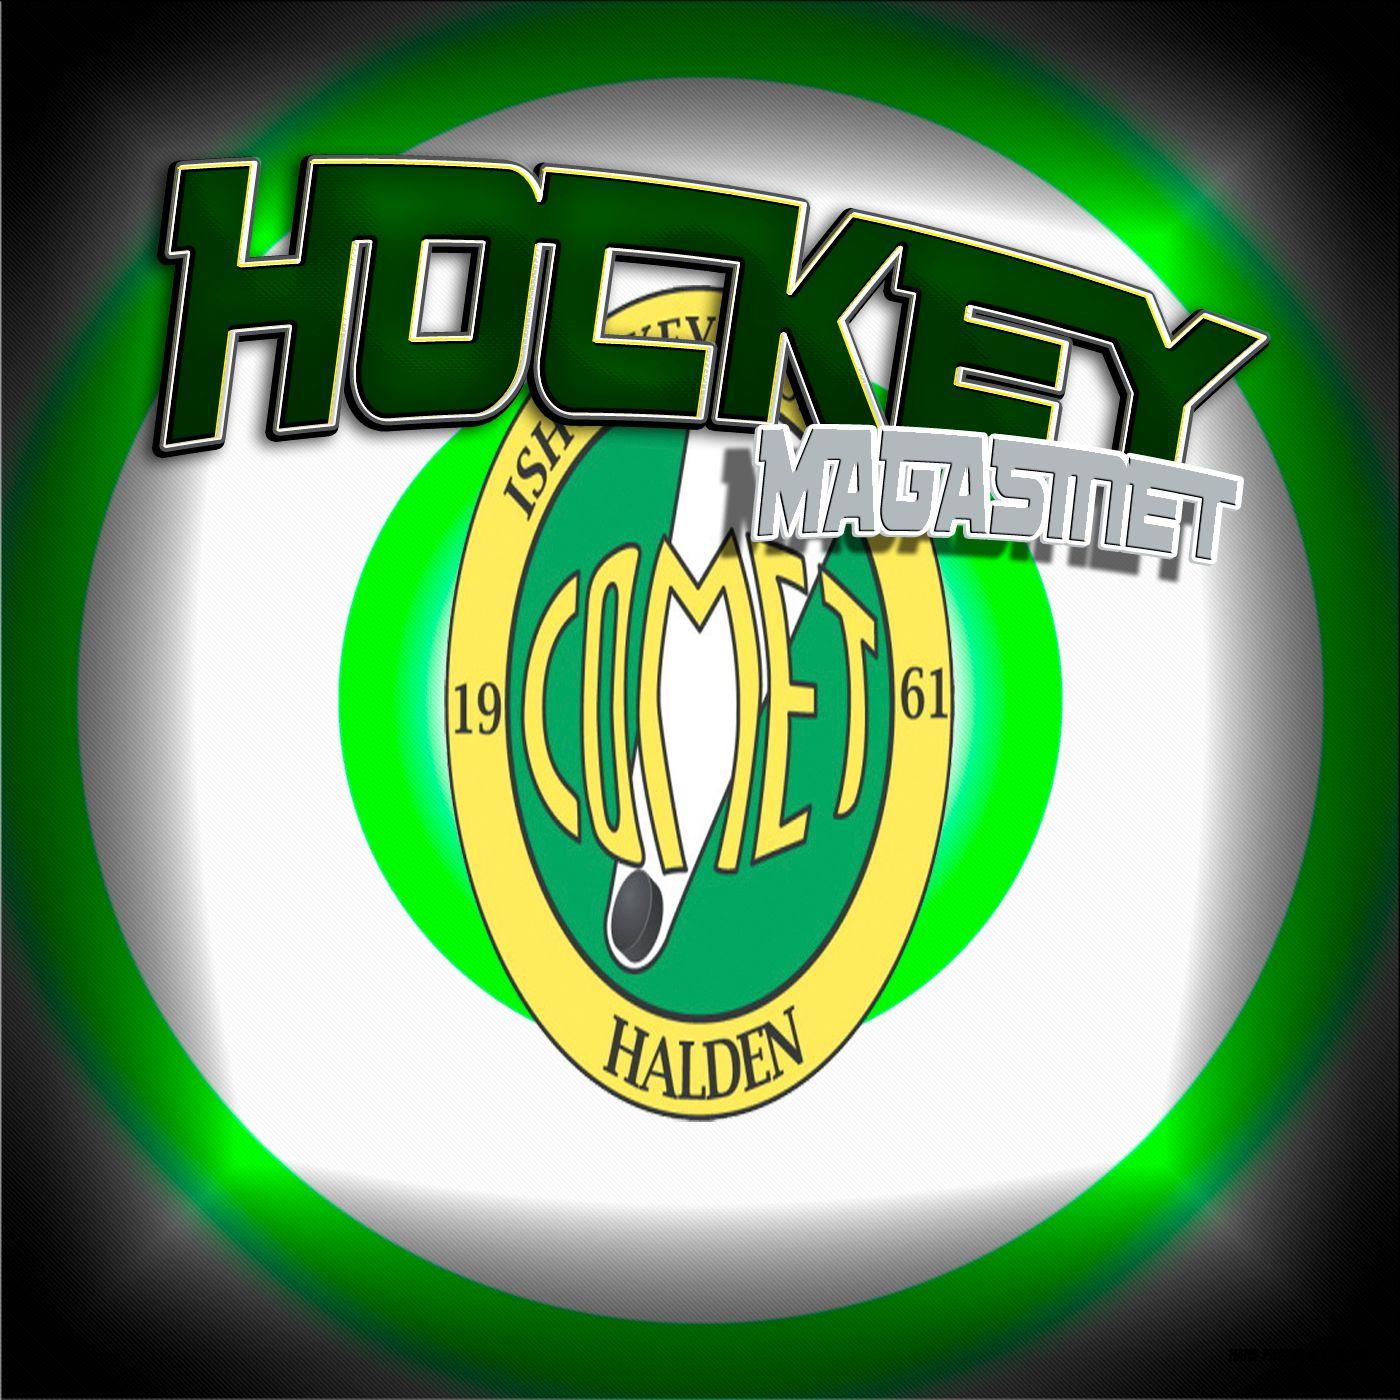 Hockeymagasinet